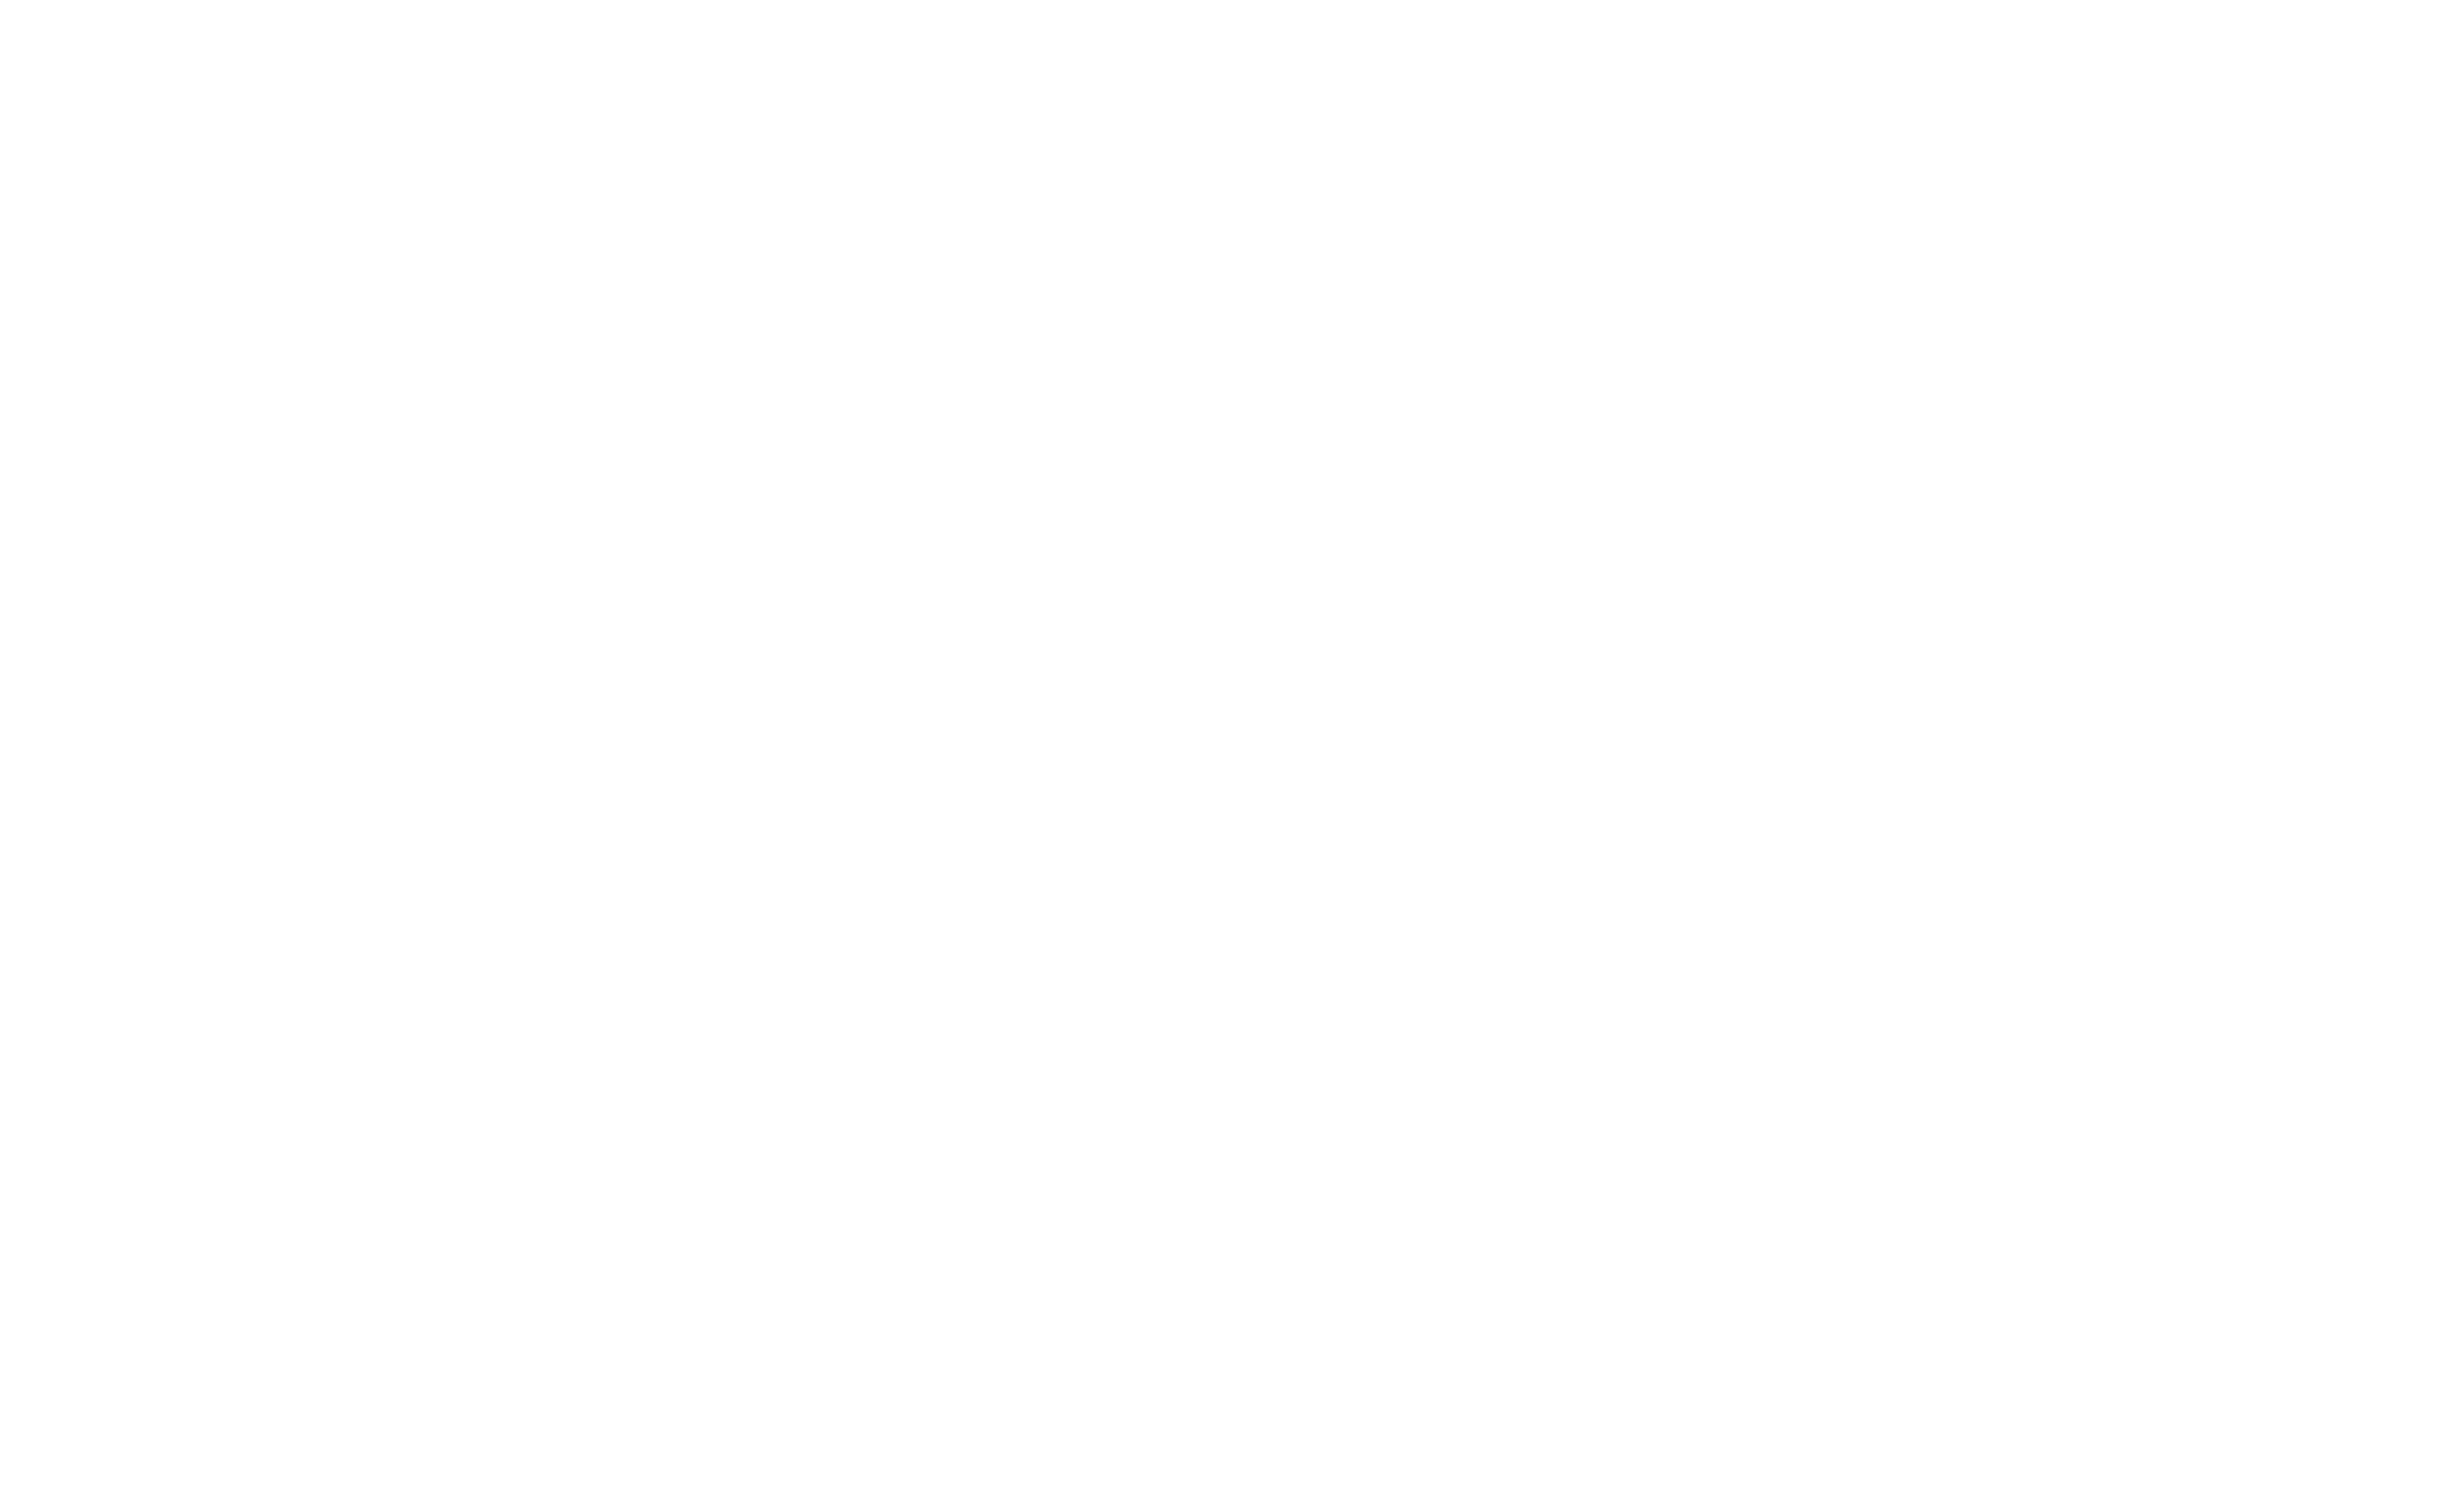 paw 814